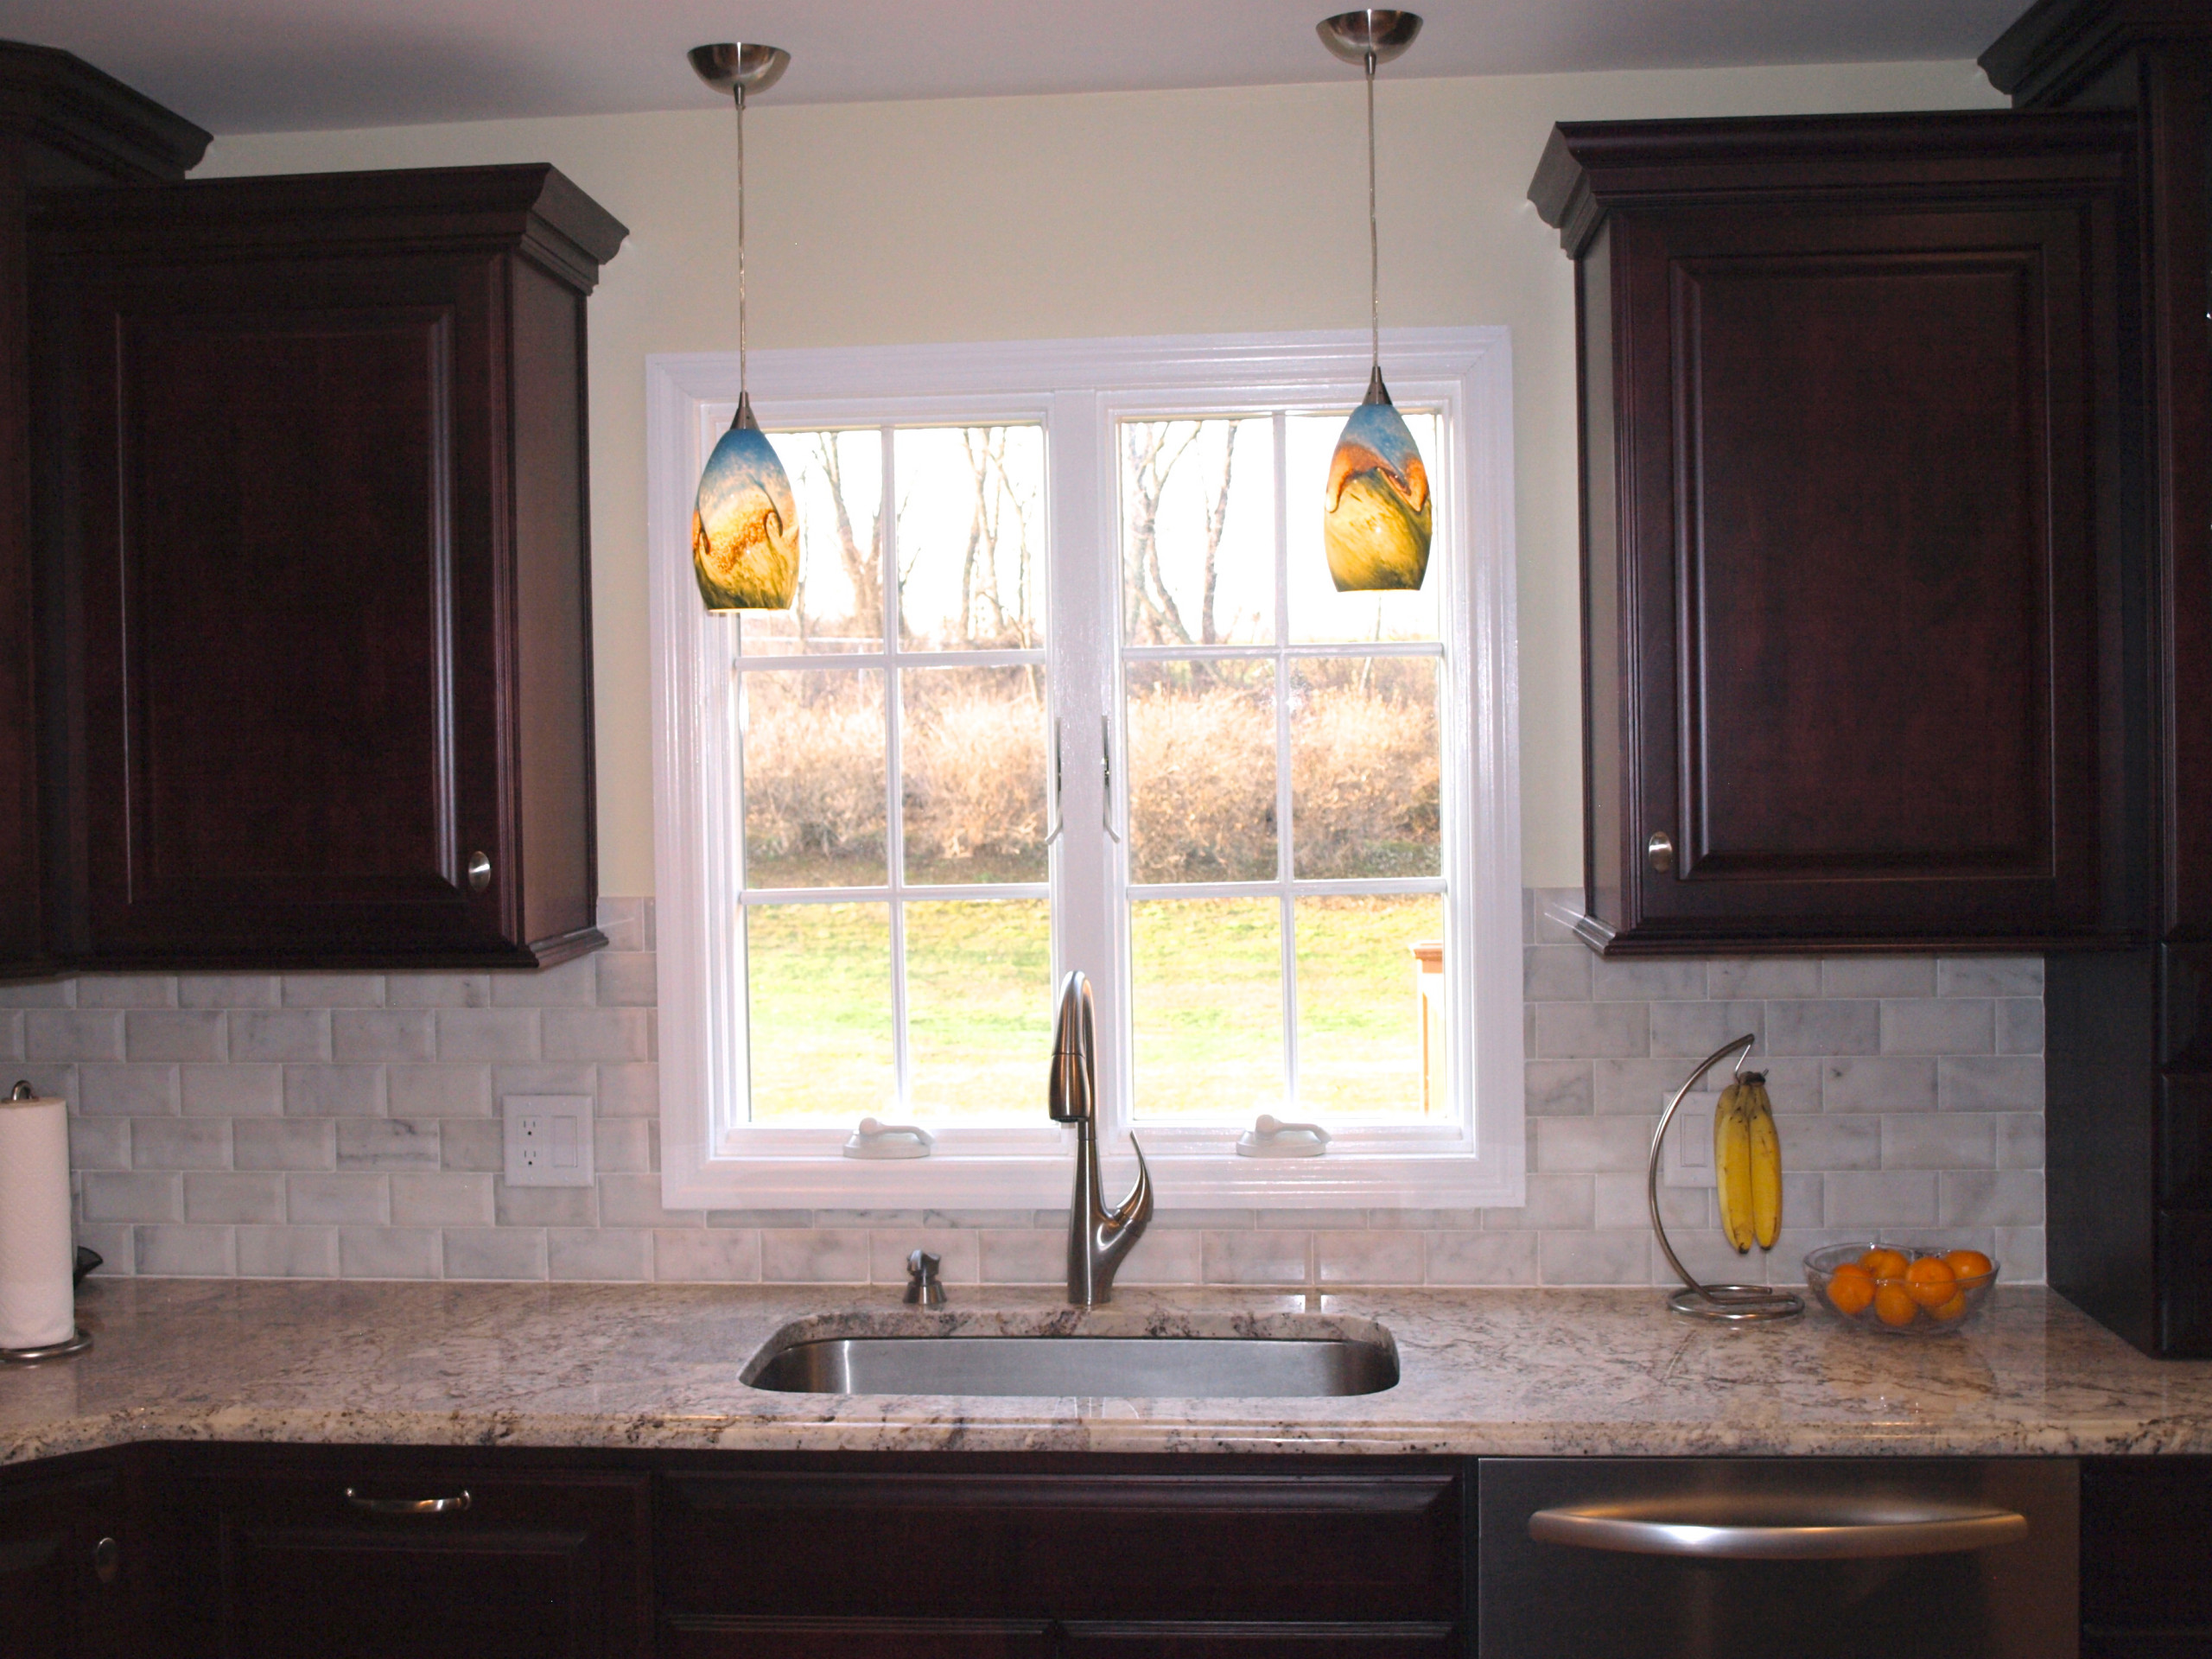 Pendant Light Over Sink Ideas Photos Houzz